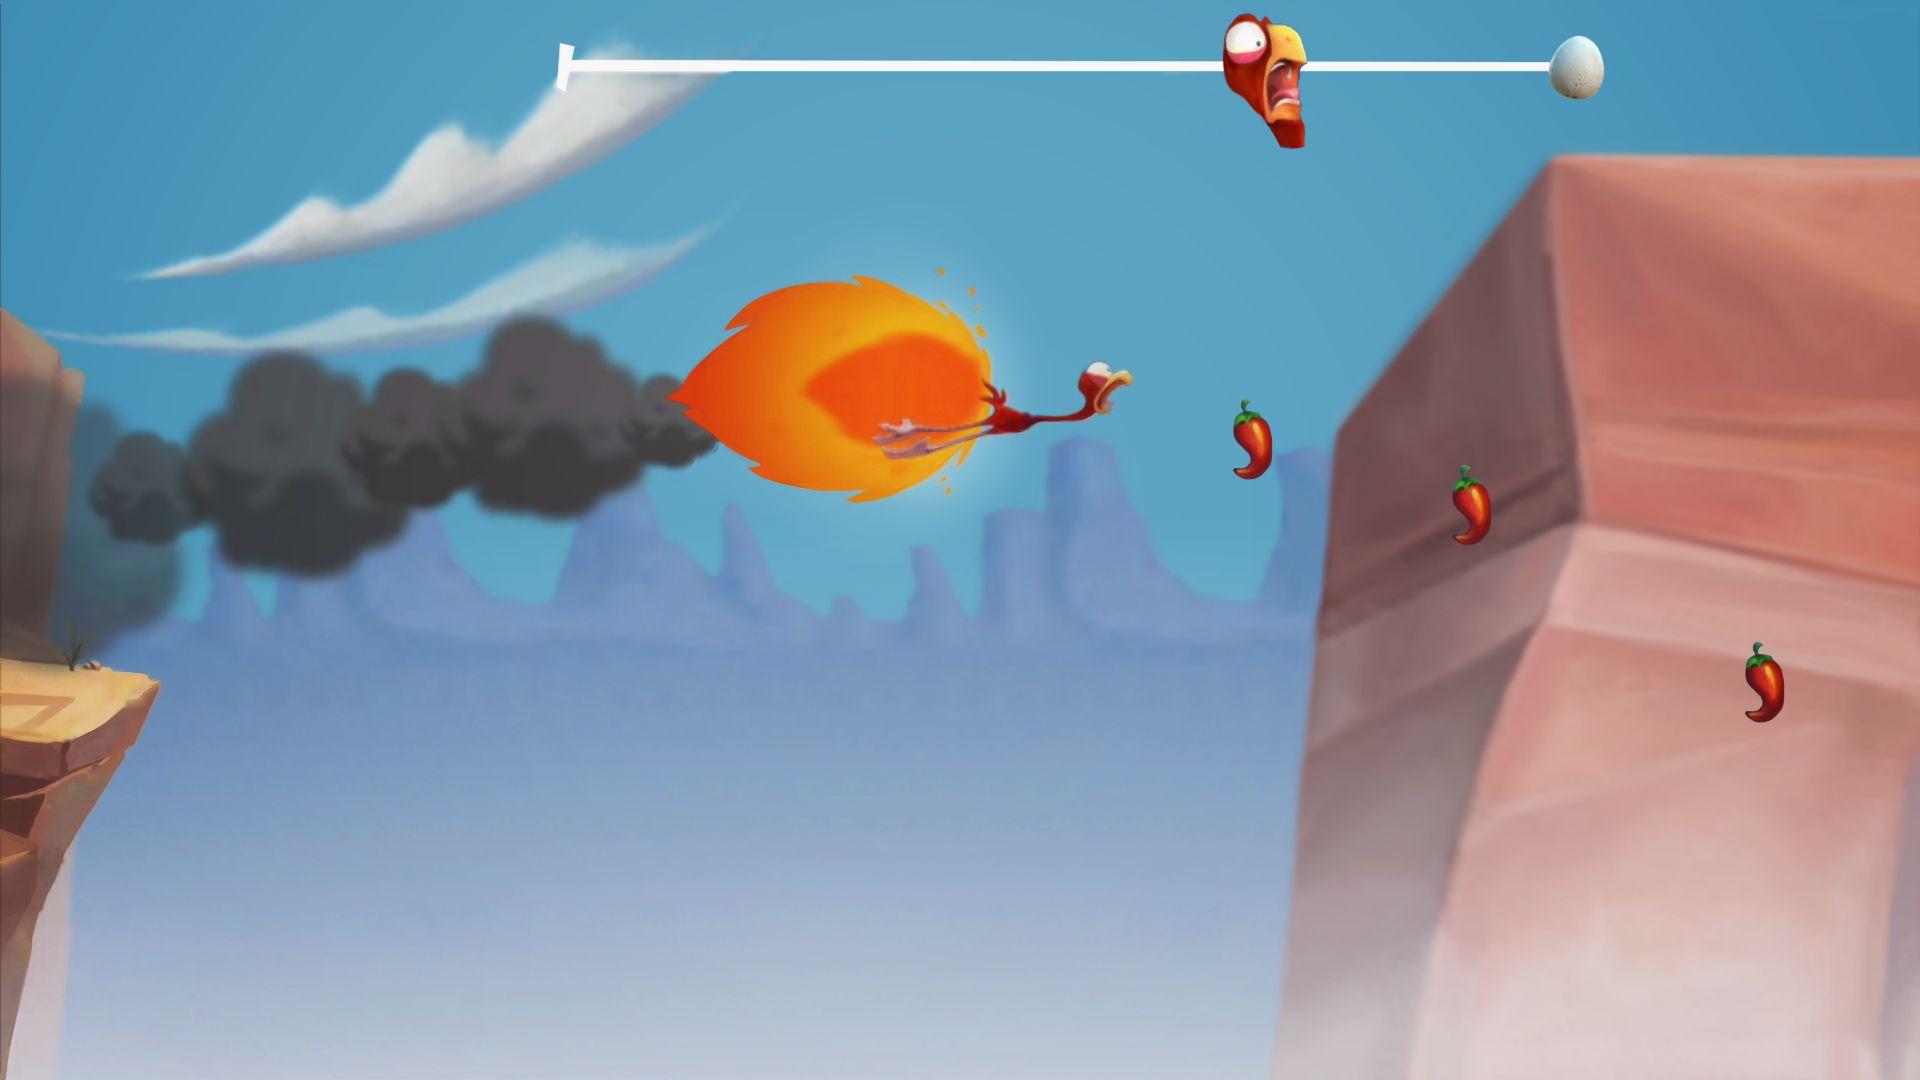 Cracké Rush - Free Endless Runner Game скріншот 1